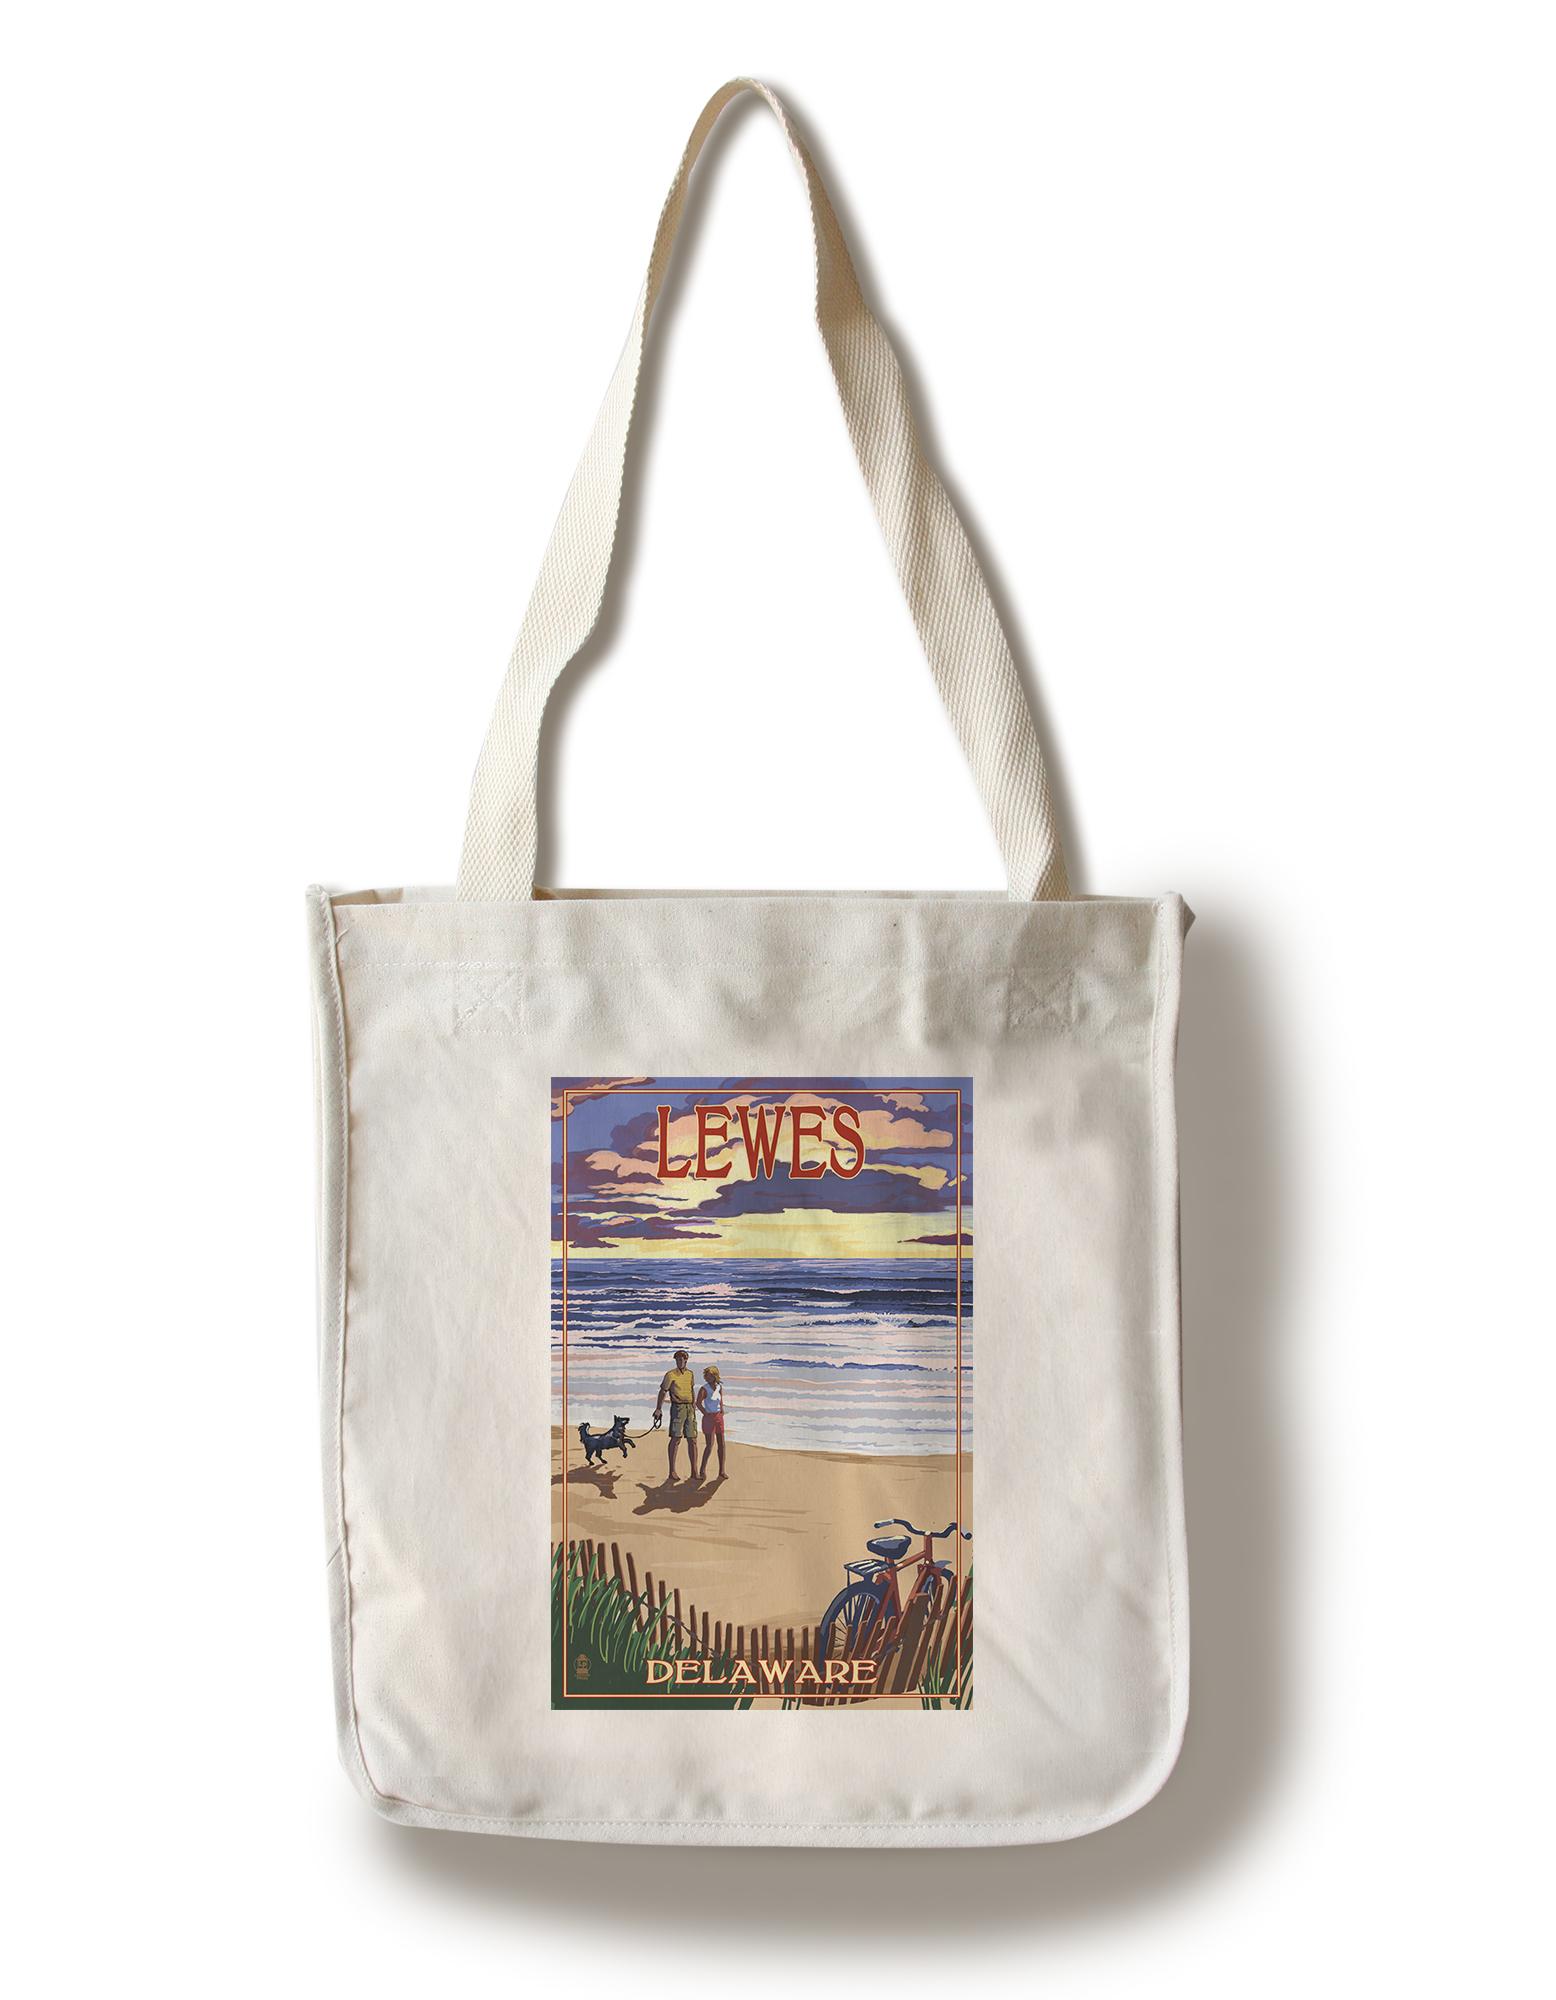 Lewes, Delaware - Beach & Sunset - Lantern Press Artwork (100% Cotton Tote Bag - Reusable)